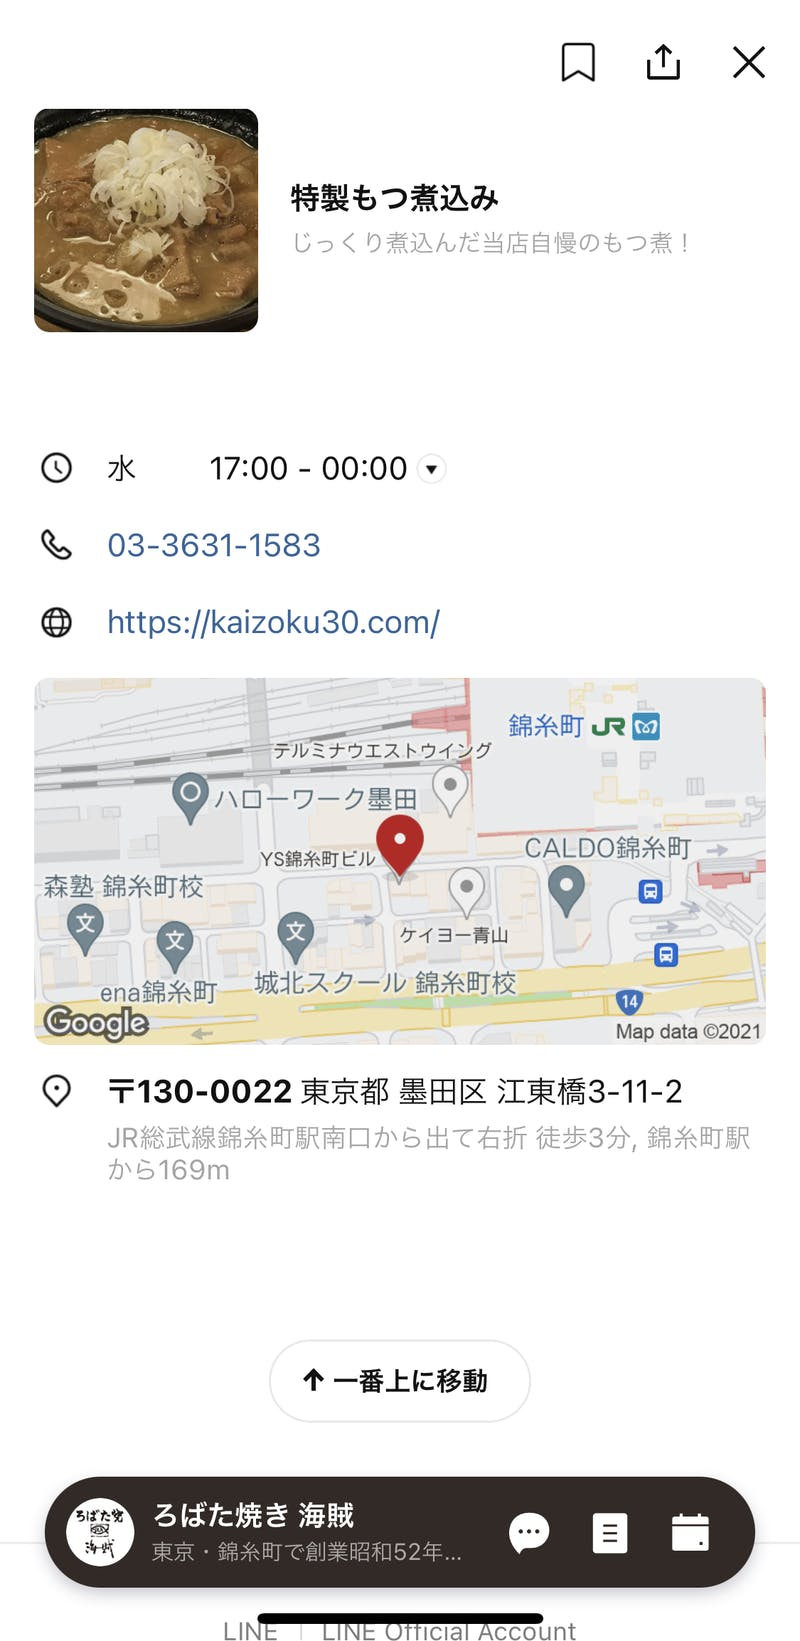 LINE公式アカウントプロフィールに掲載される地図